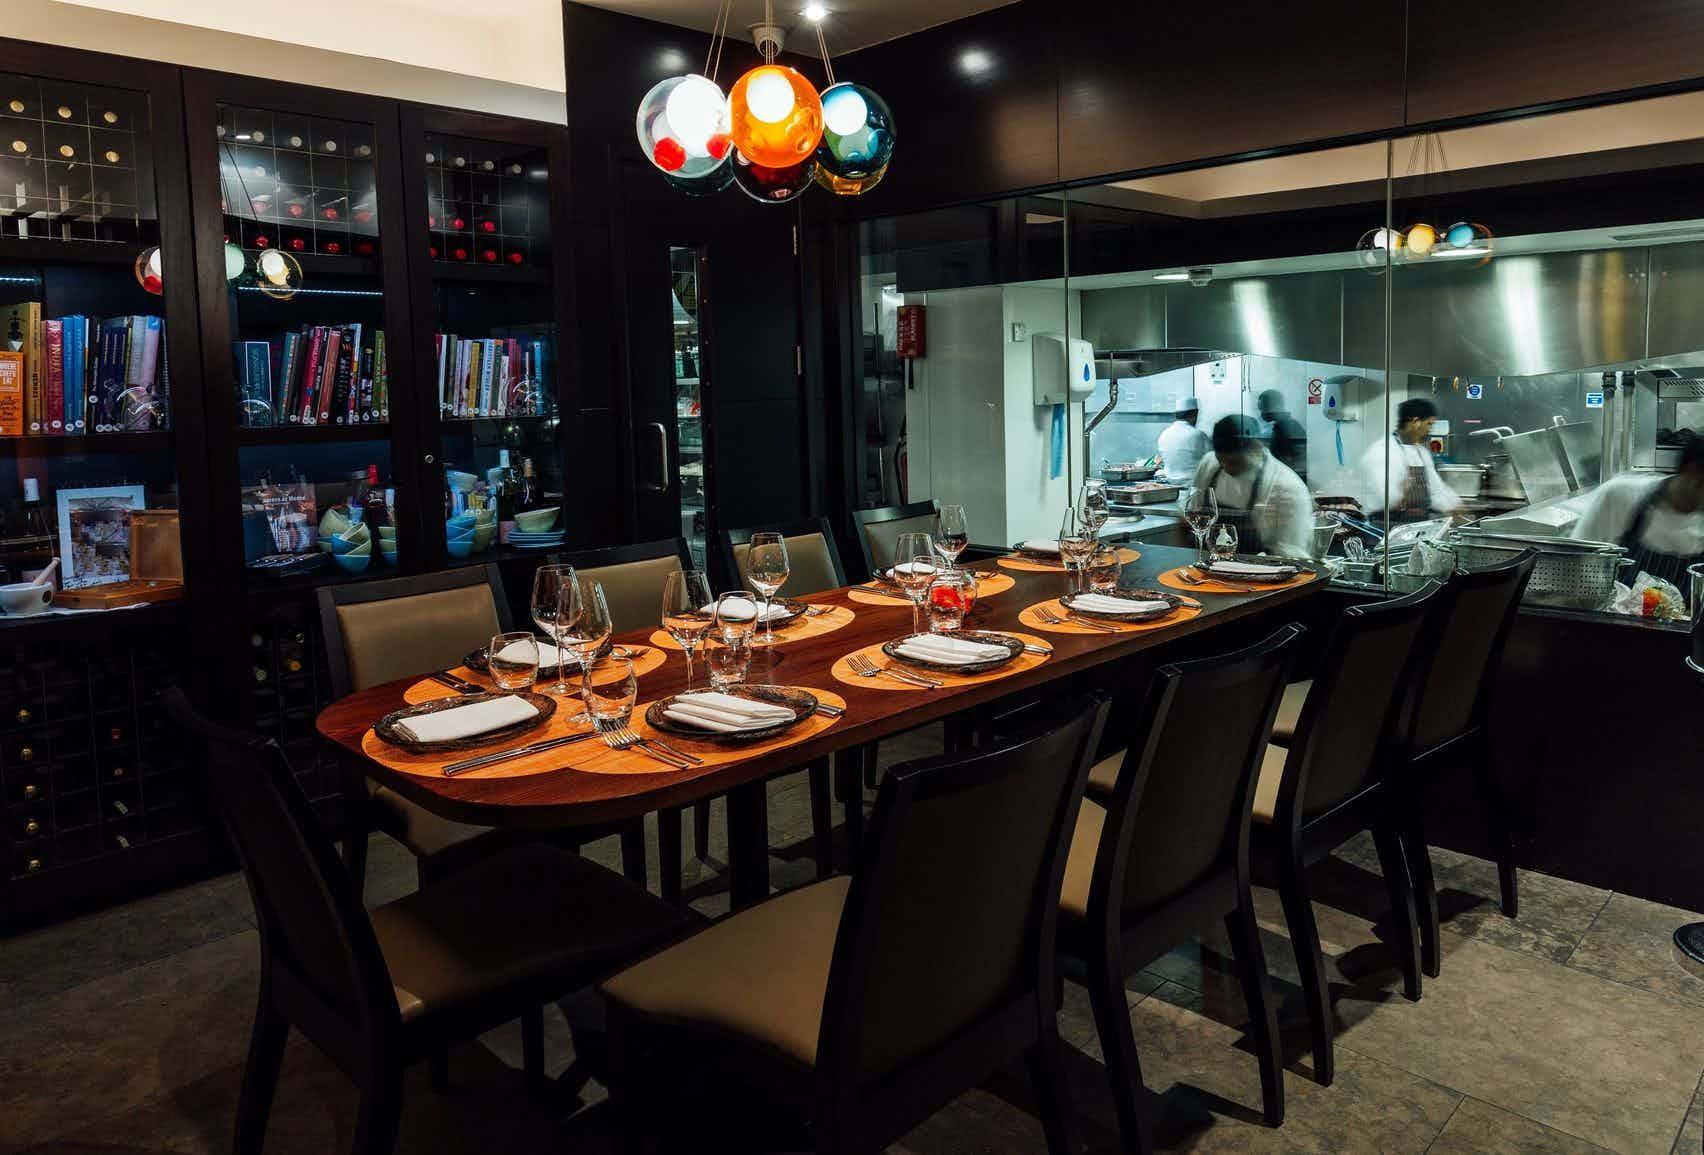 Chef's Table, Benares Restaurant & Bar